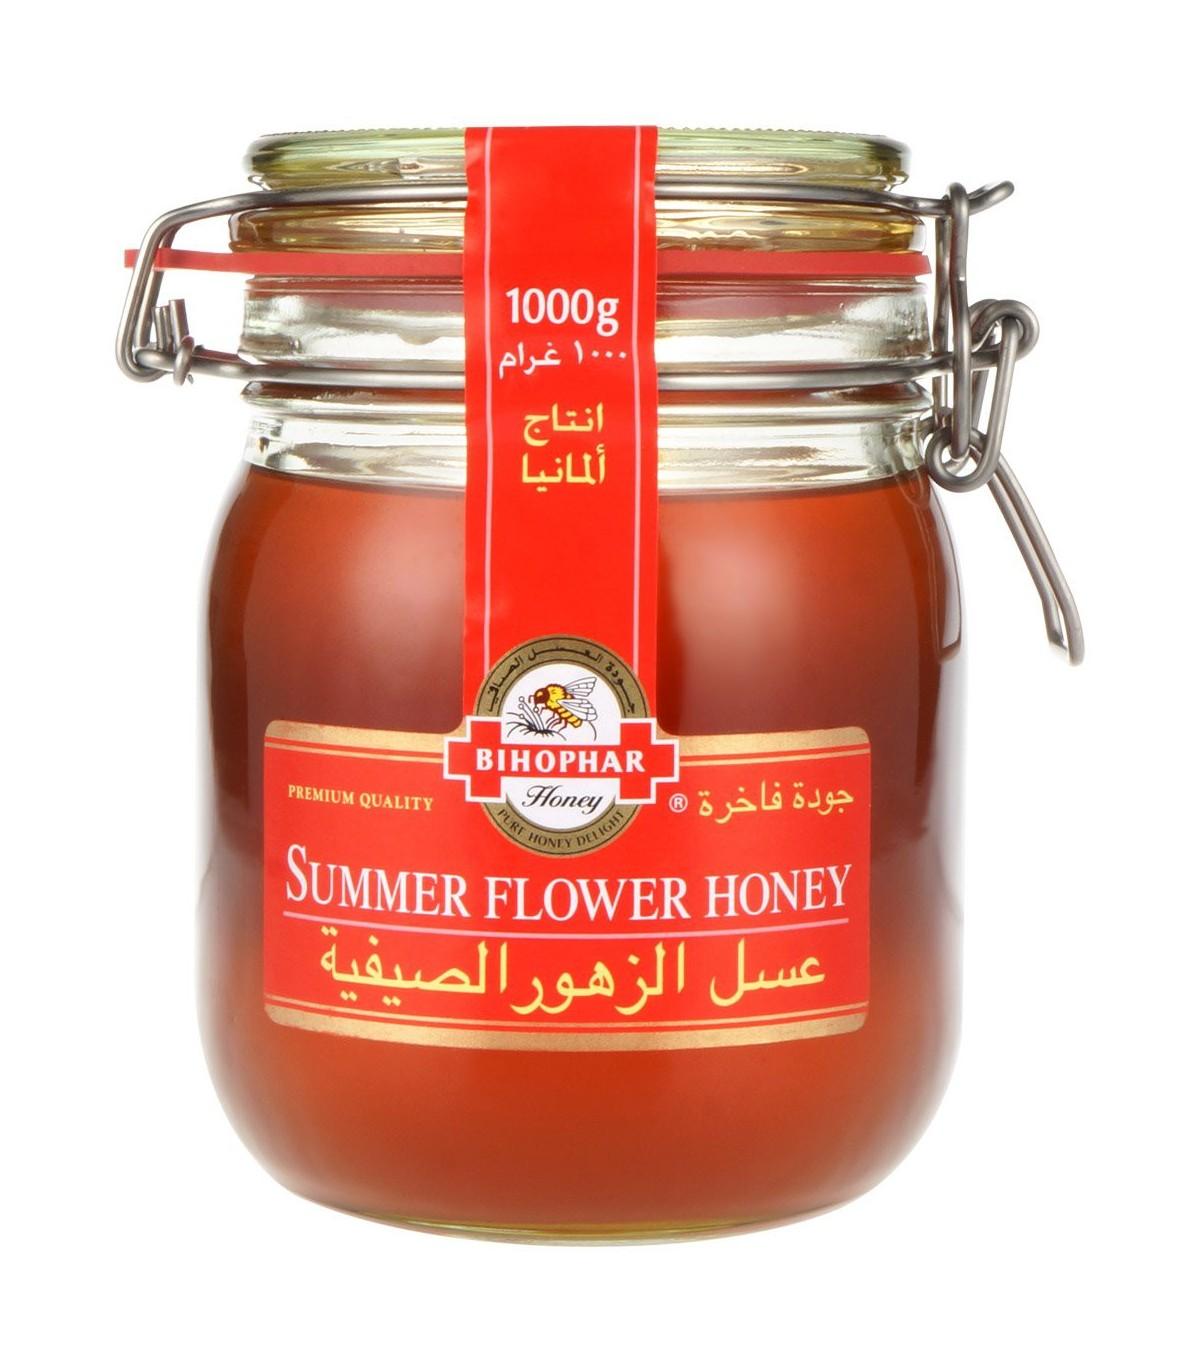 biophar-عسل-خالص-درجه-یک-سامر-فلاور-1-کیلویی-بایوفار